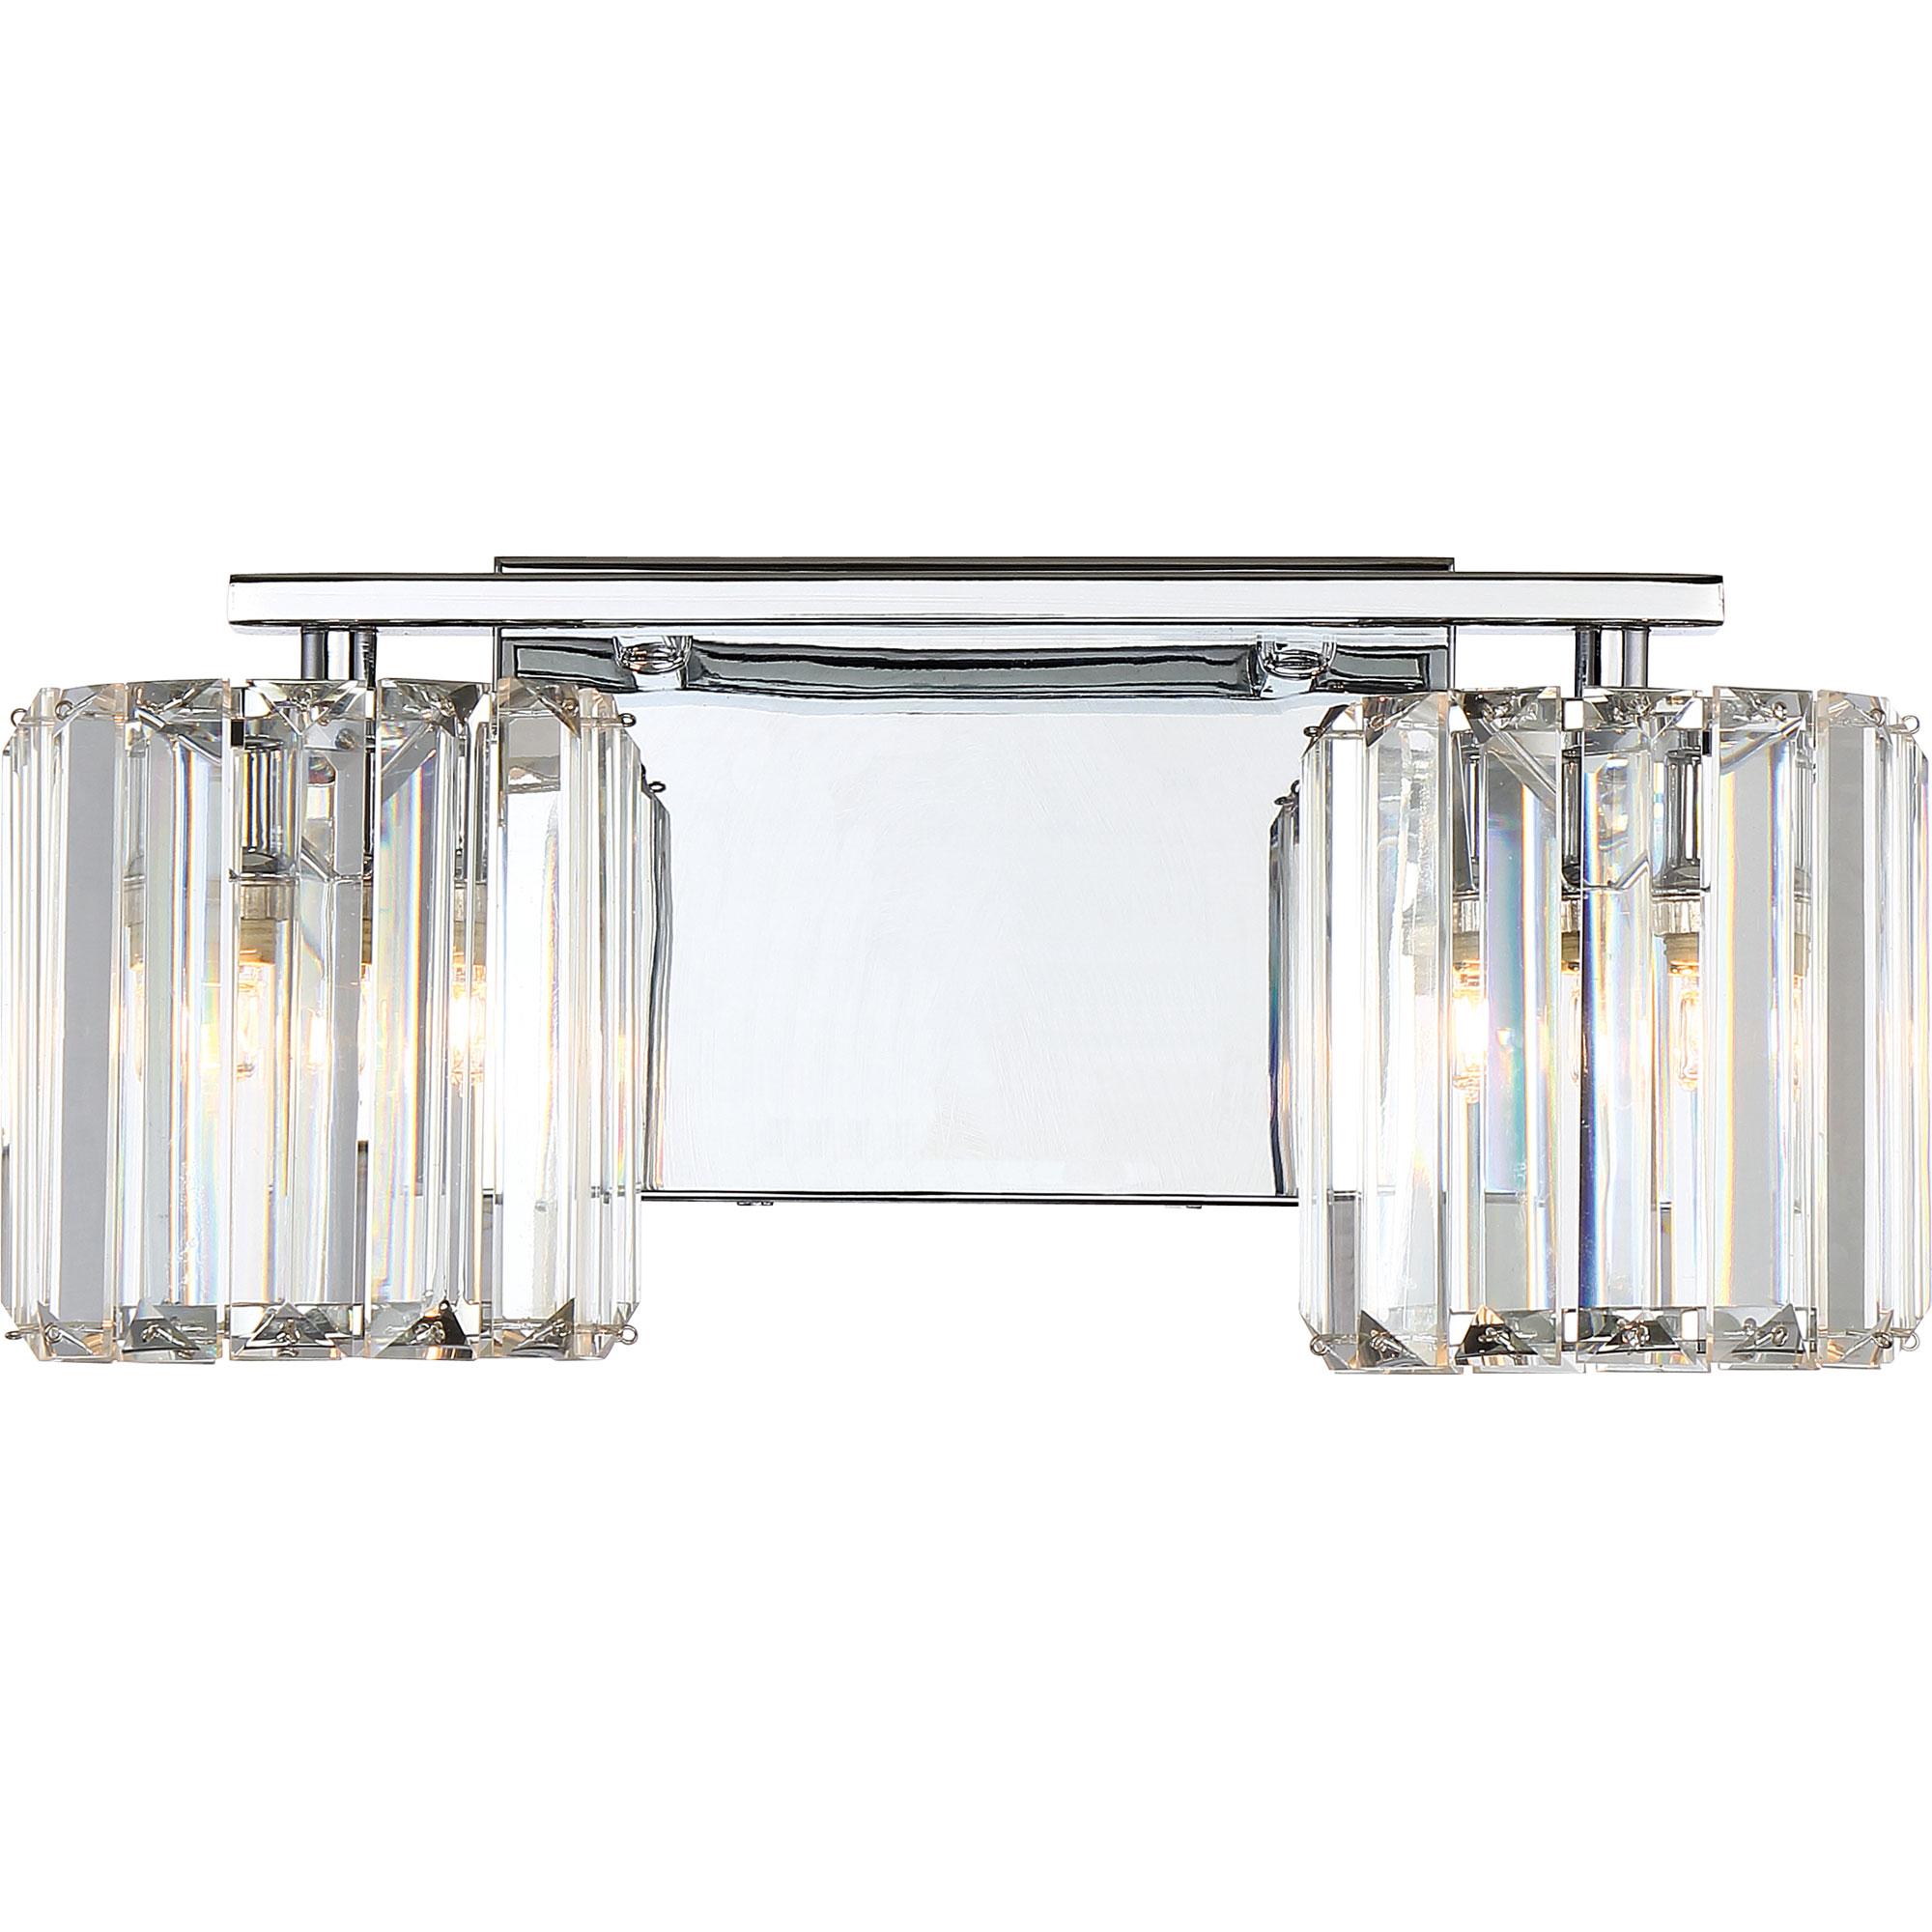 quoizel vanity light lighting platinum divine bathroom vanity light by quoizel pcdv8602cled